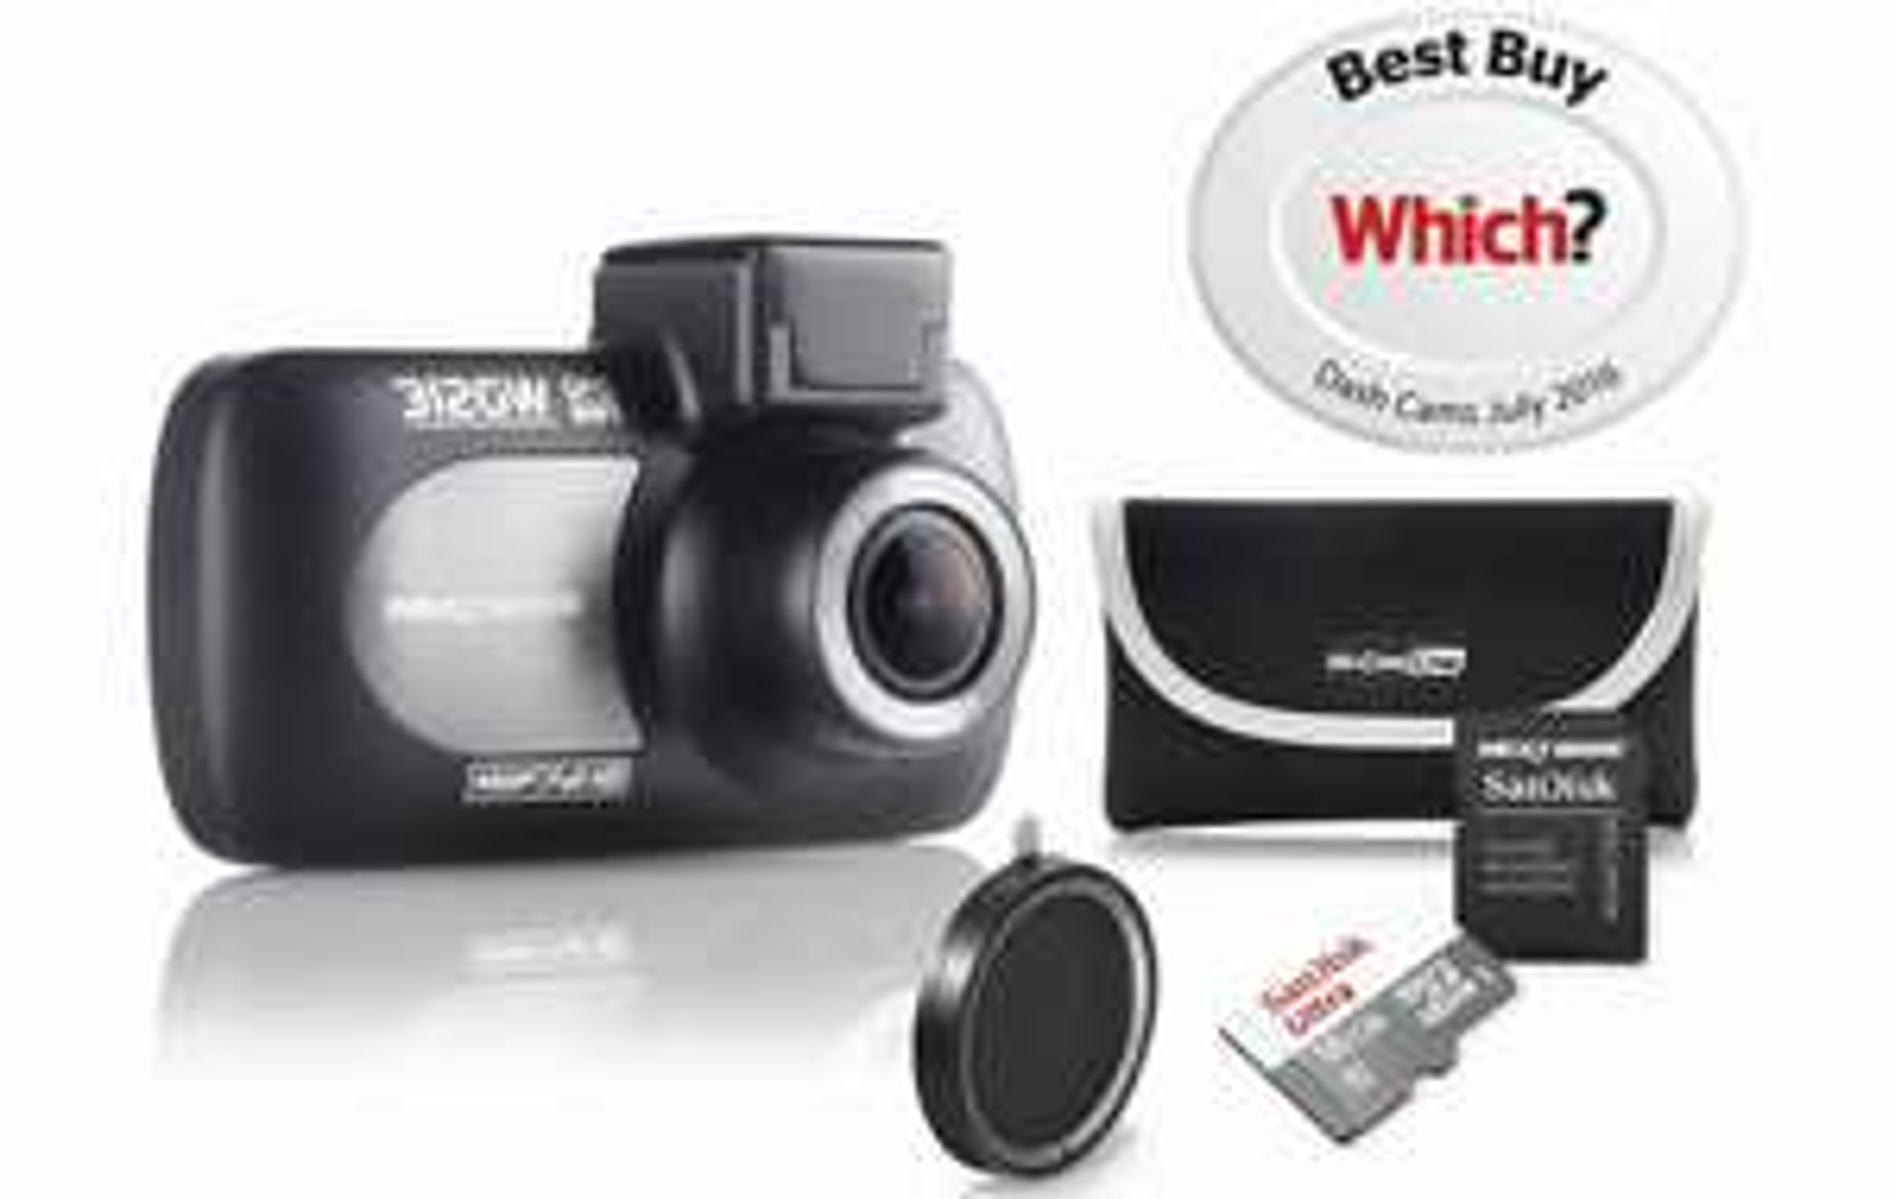 Halfords Nextbase 312gw + 16gb memory card + case+ polarising lens - £99